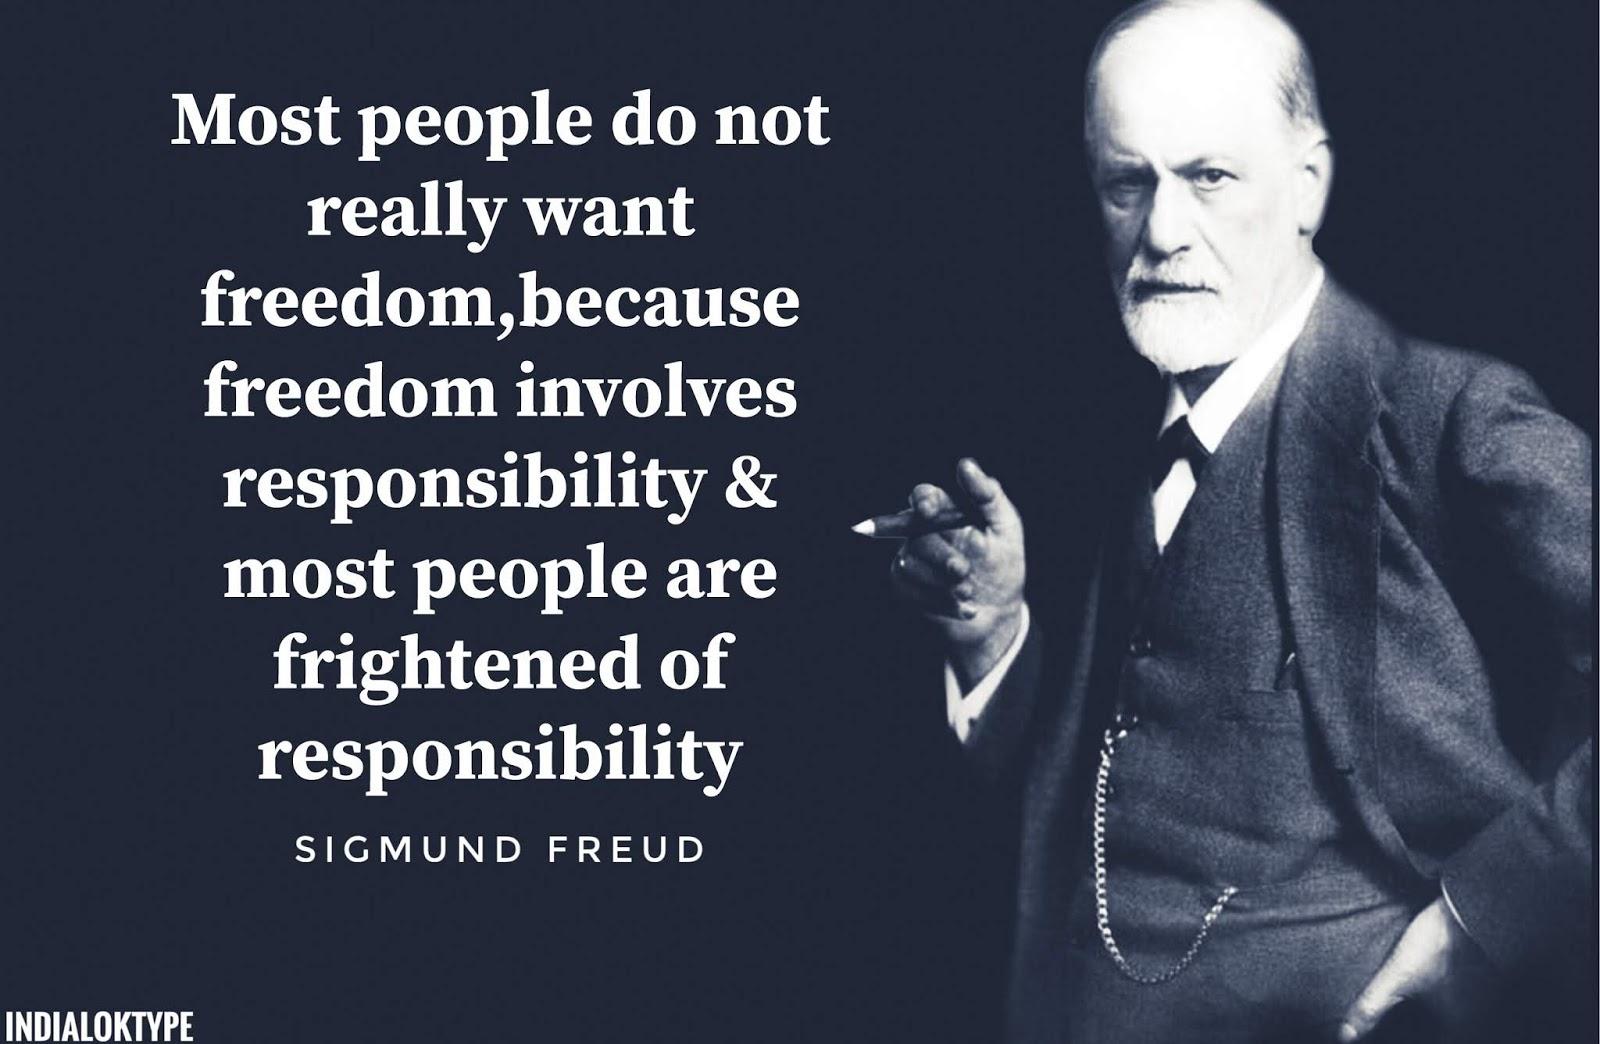 Sigmund Freud Indialoktype